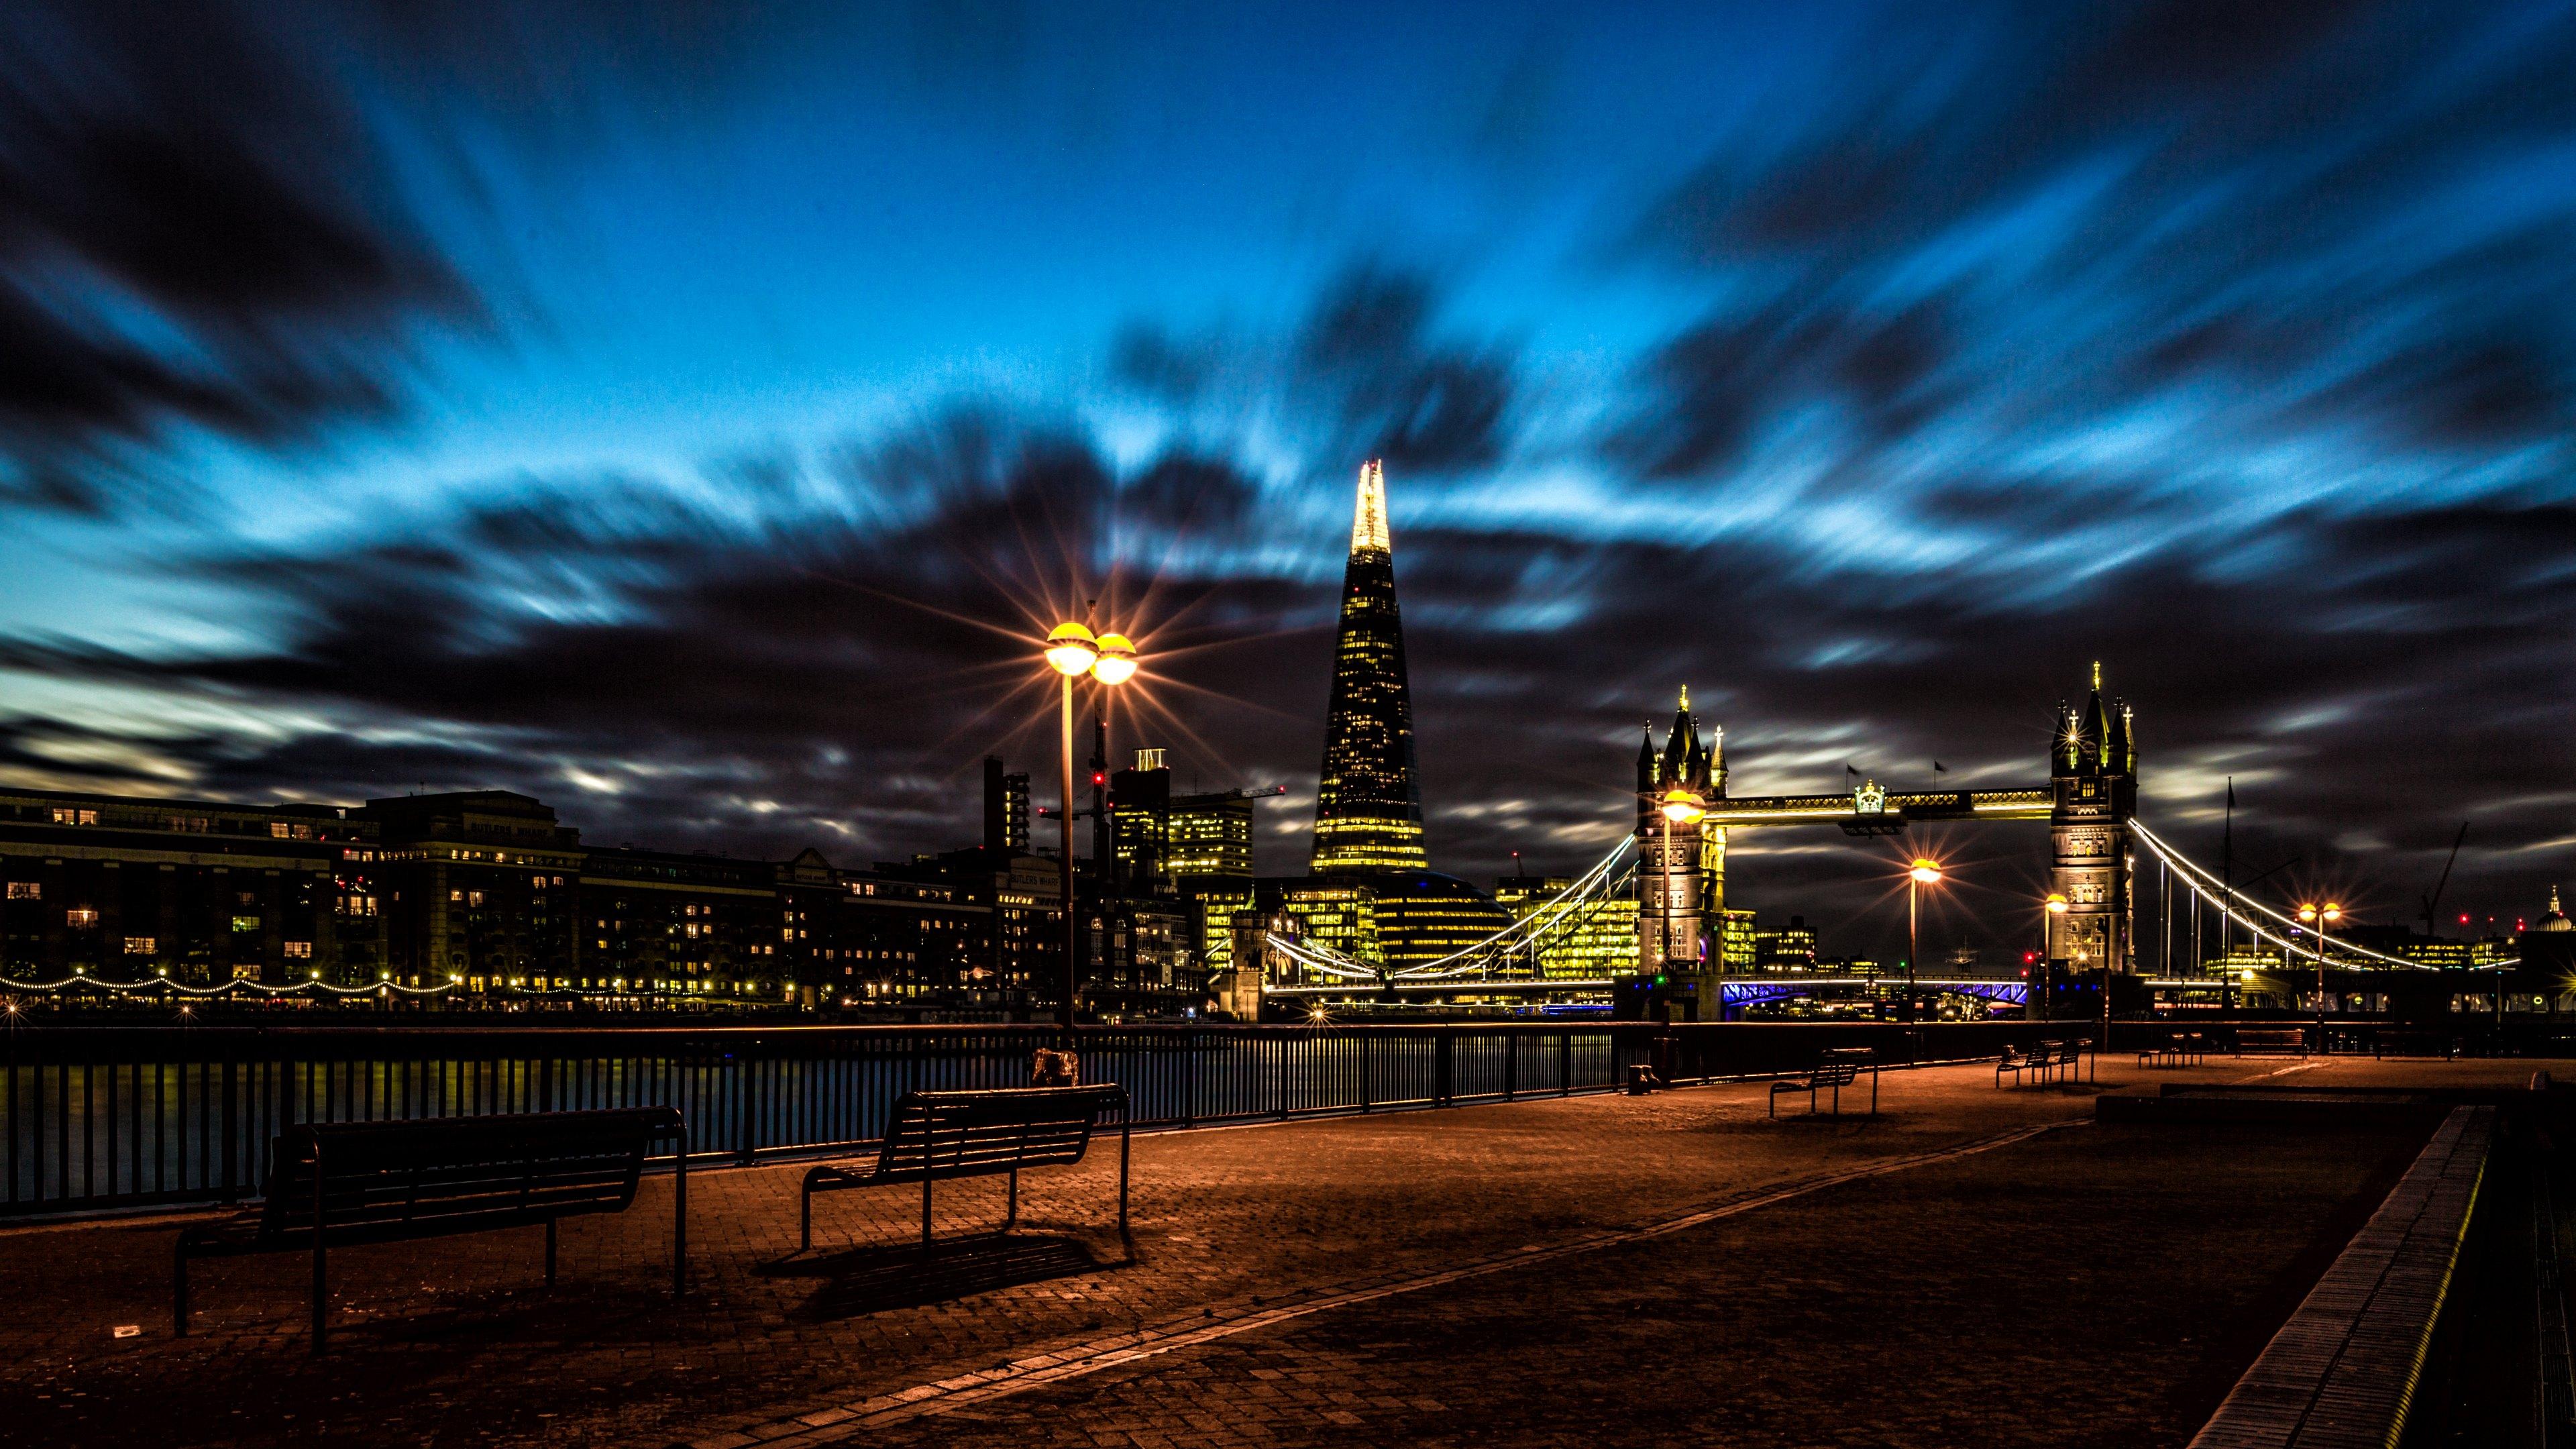 Night Bridge London Cityscape HD Wallpapers 183 4K 3840x2160